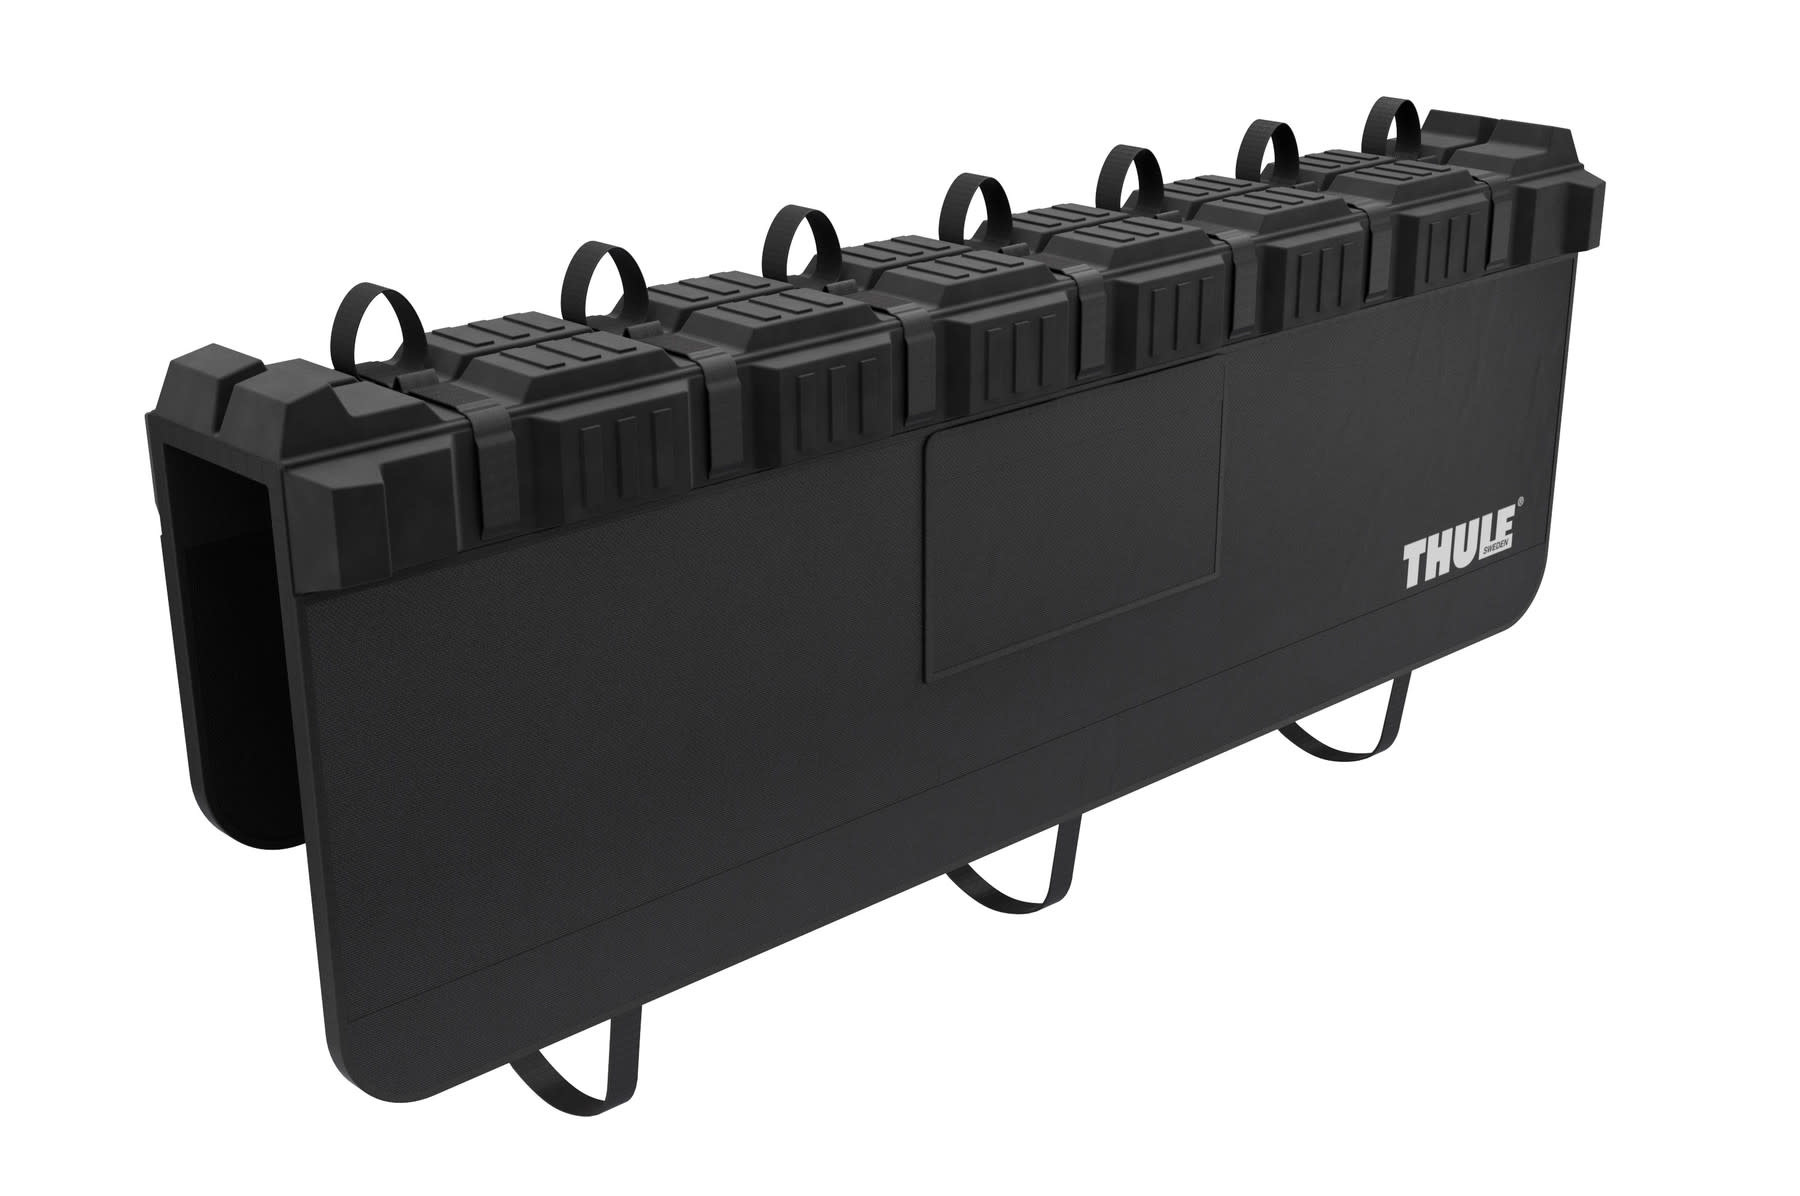 THULE Thule GateMate Pro (Large)